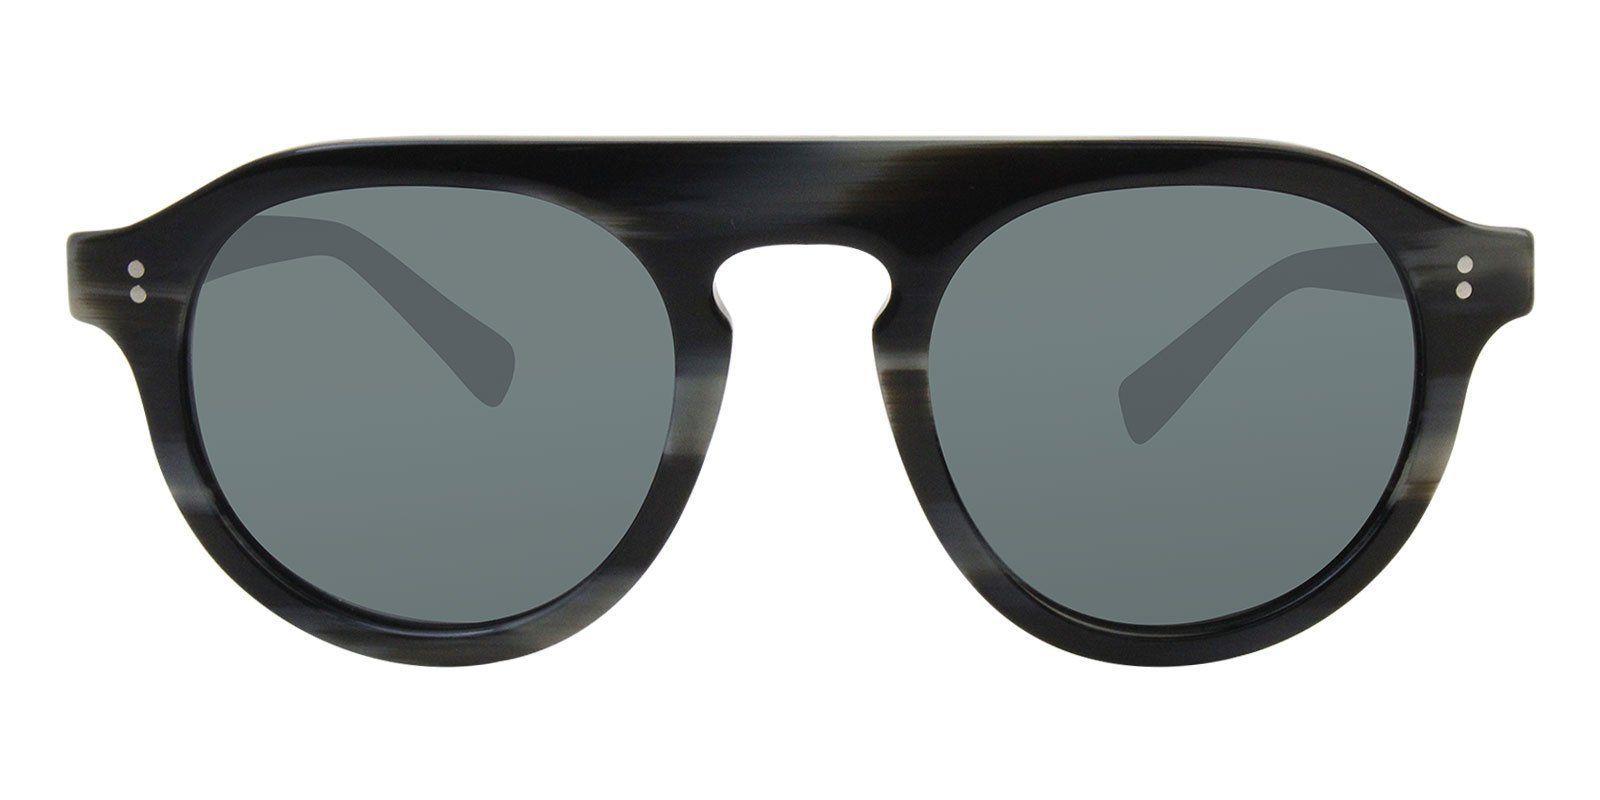 e22062223bb7 Dolce Gabbana - DG4306 Blue - Blue sunglasses